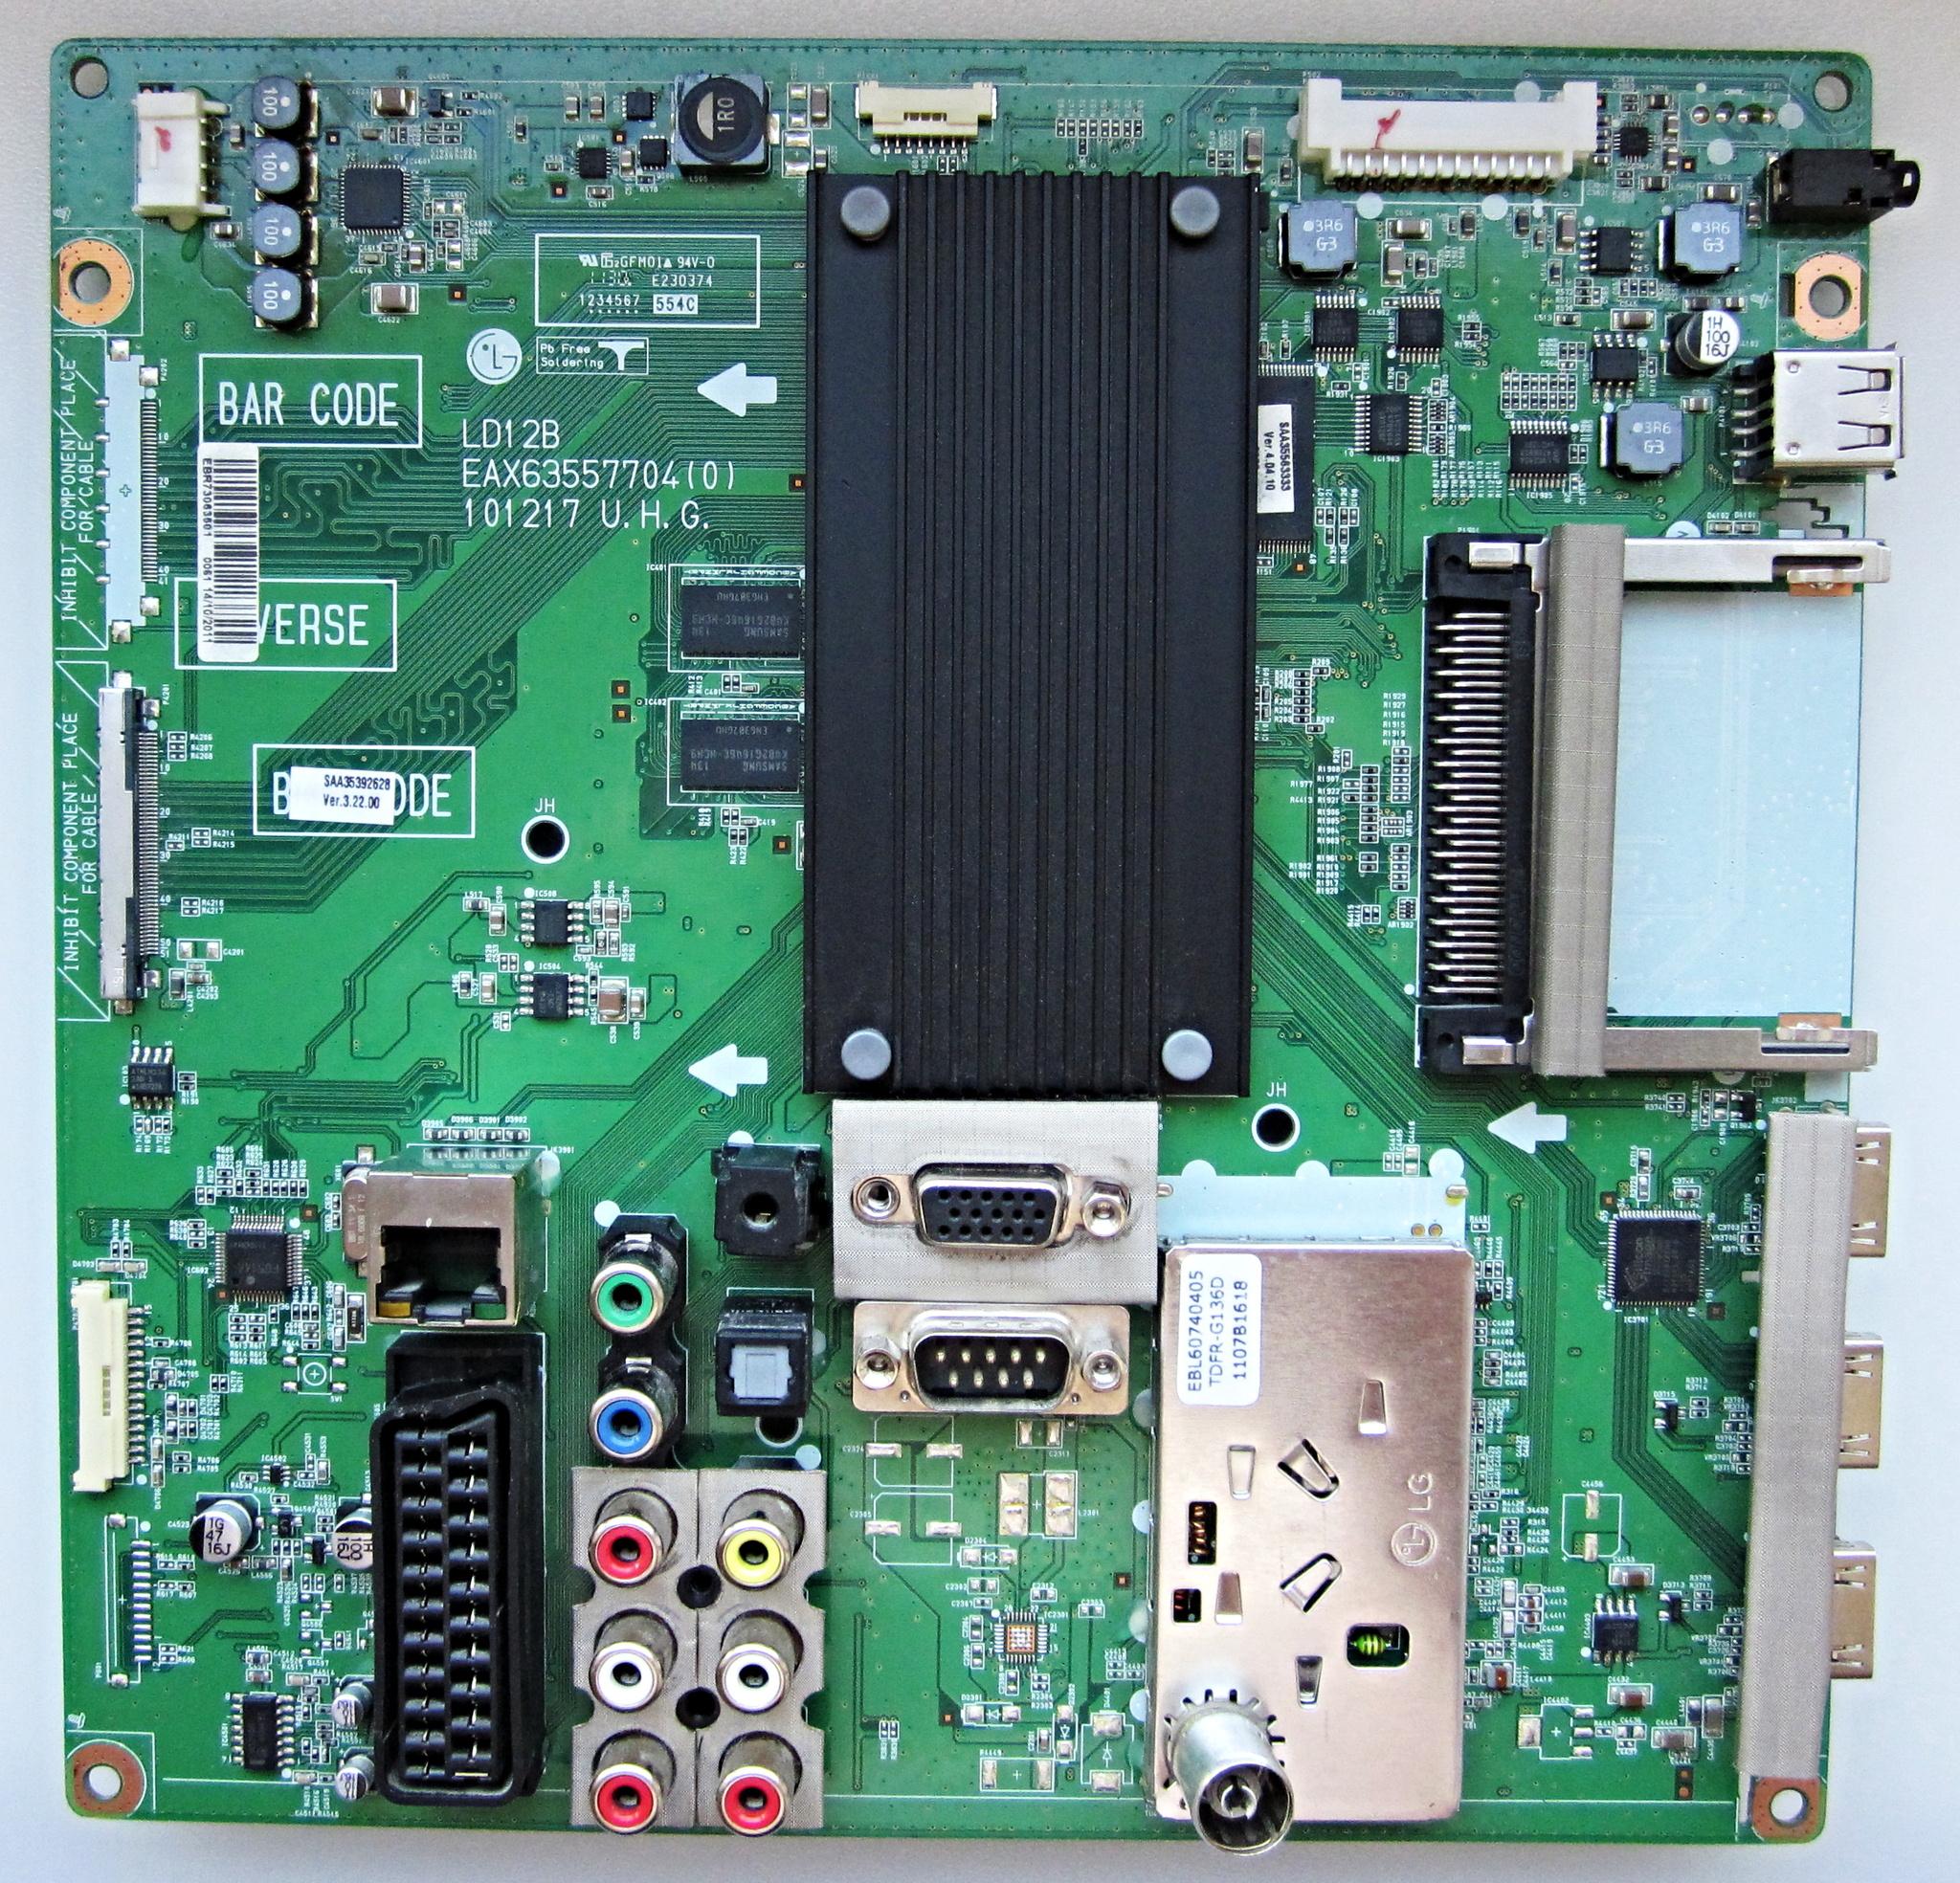 EAX63557704(0) EBR73063501